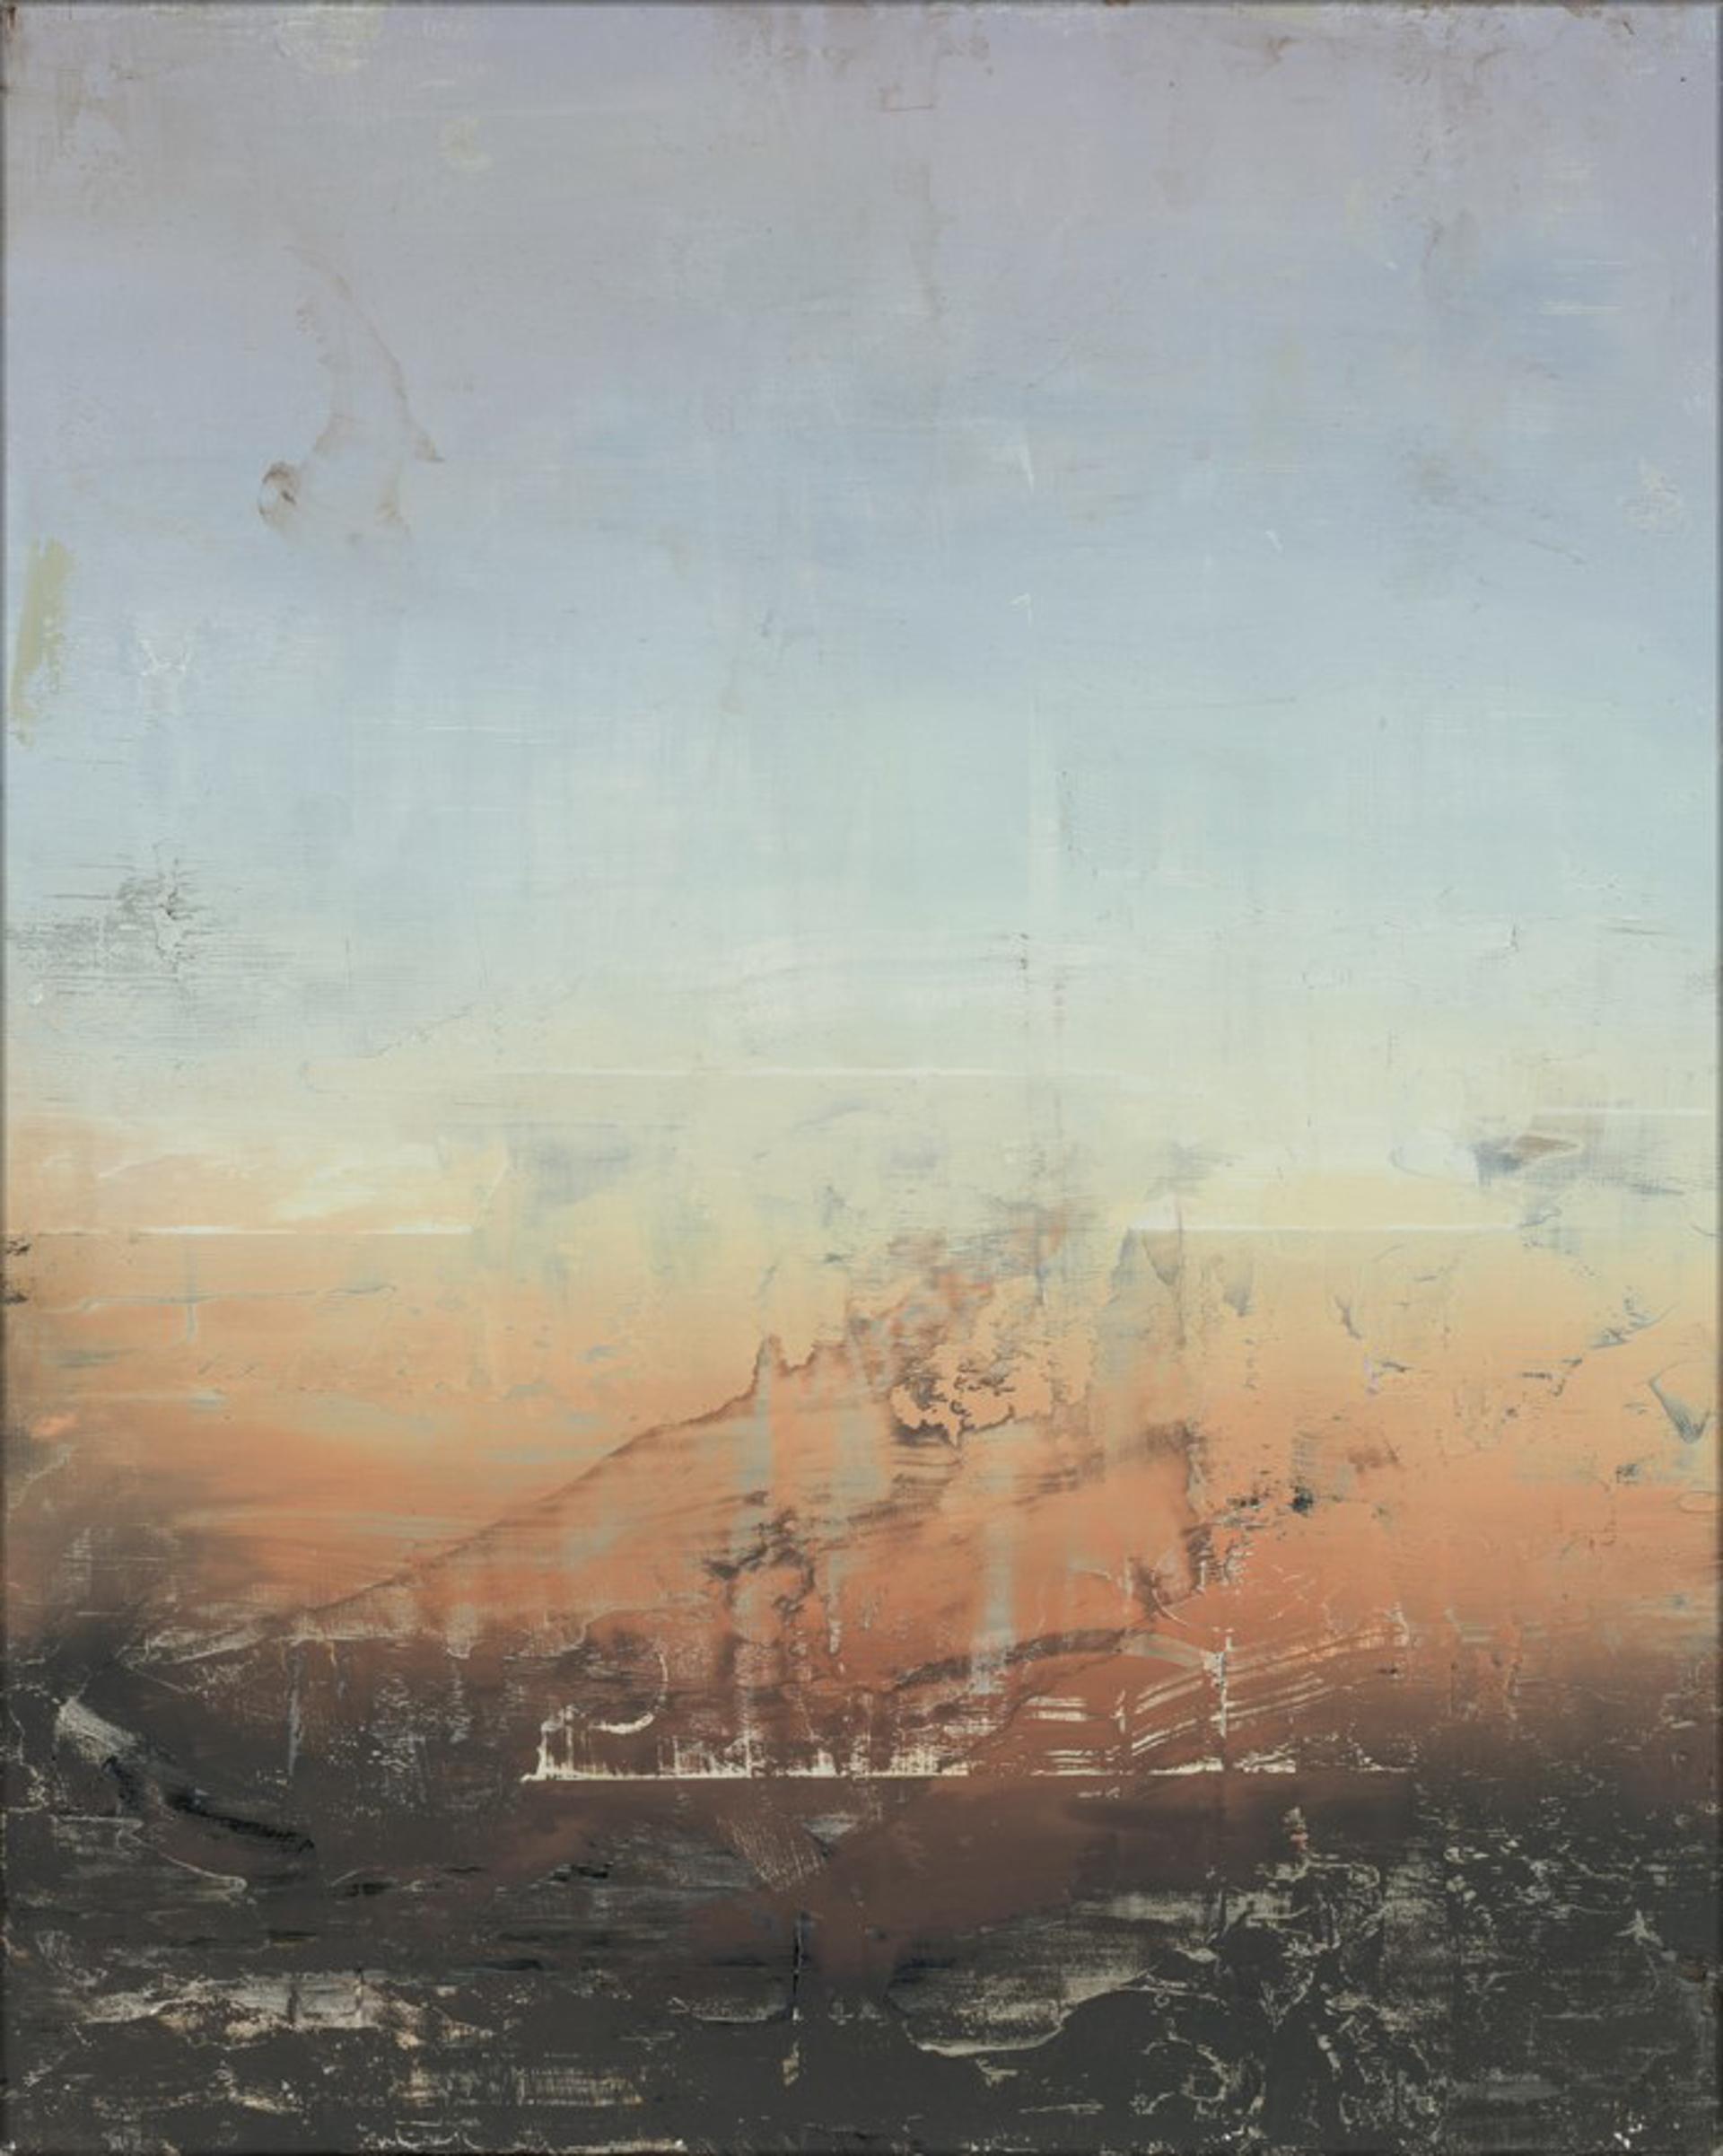 Dirty Window 3 by Matthew Saba